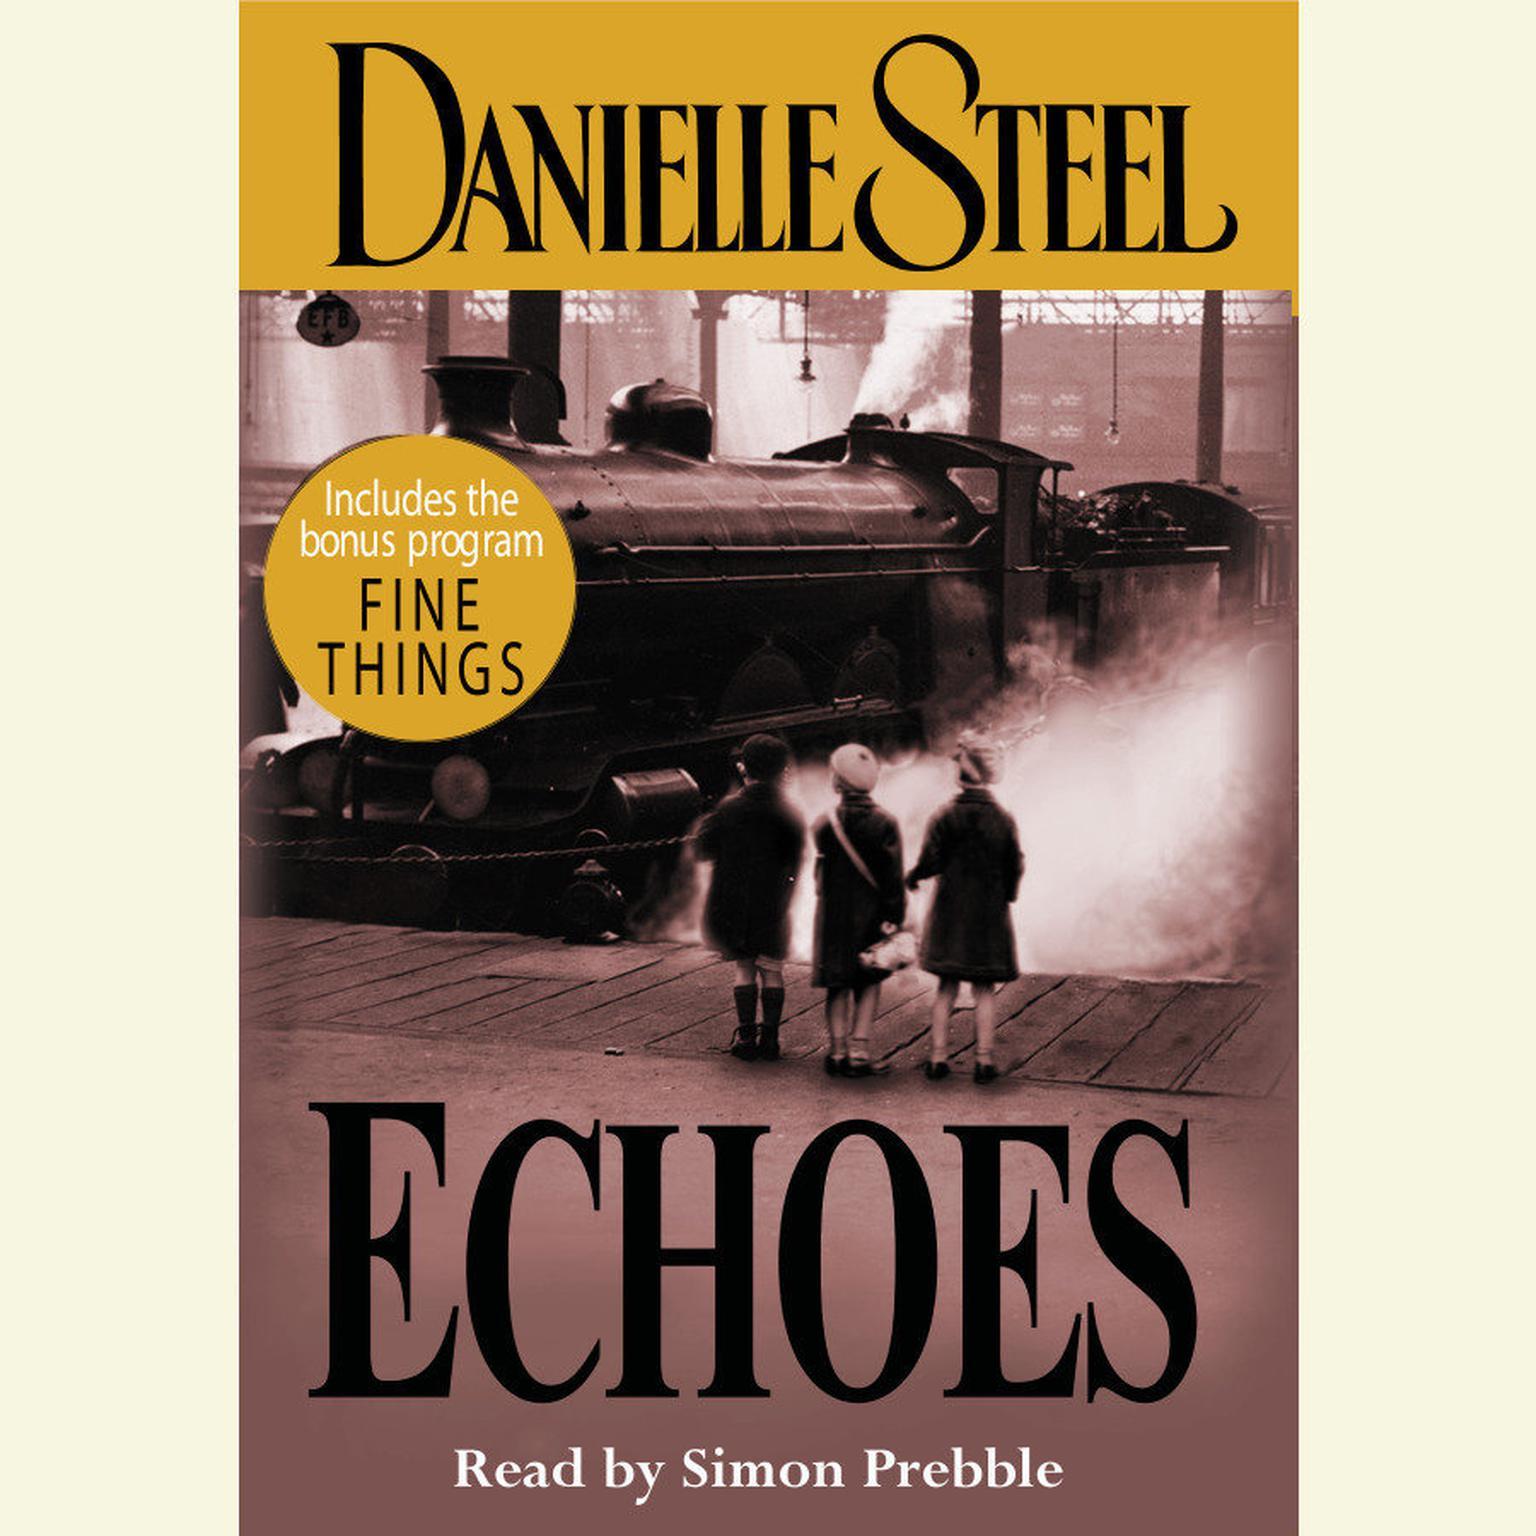 Echoes Audiobook, by Danielle Steel